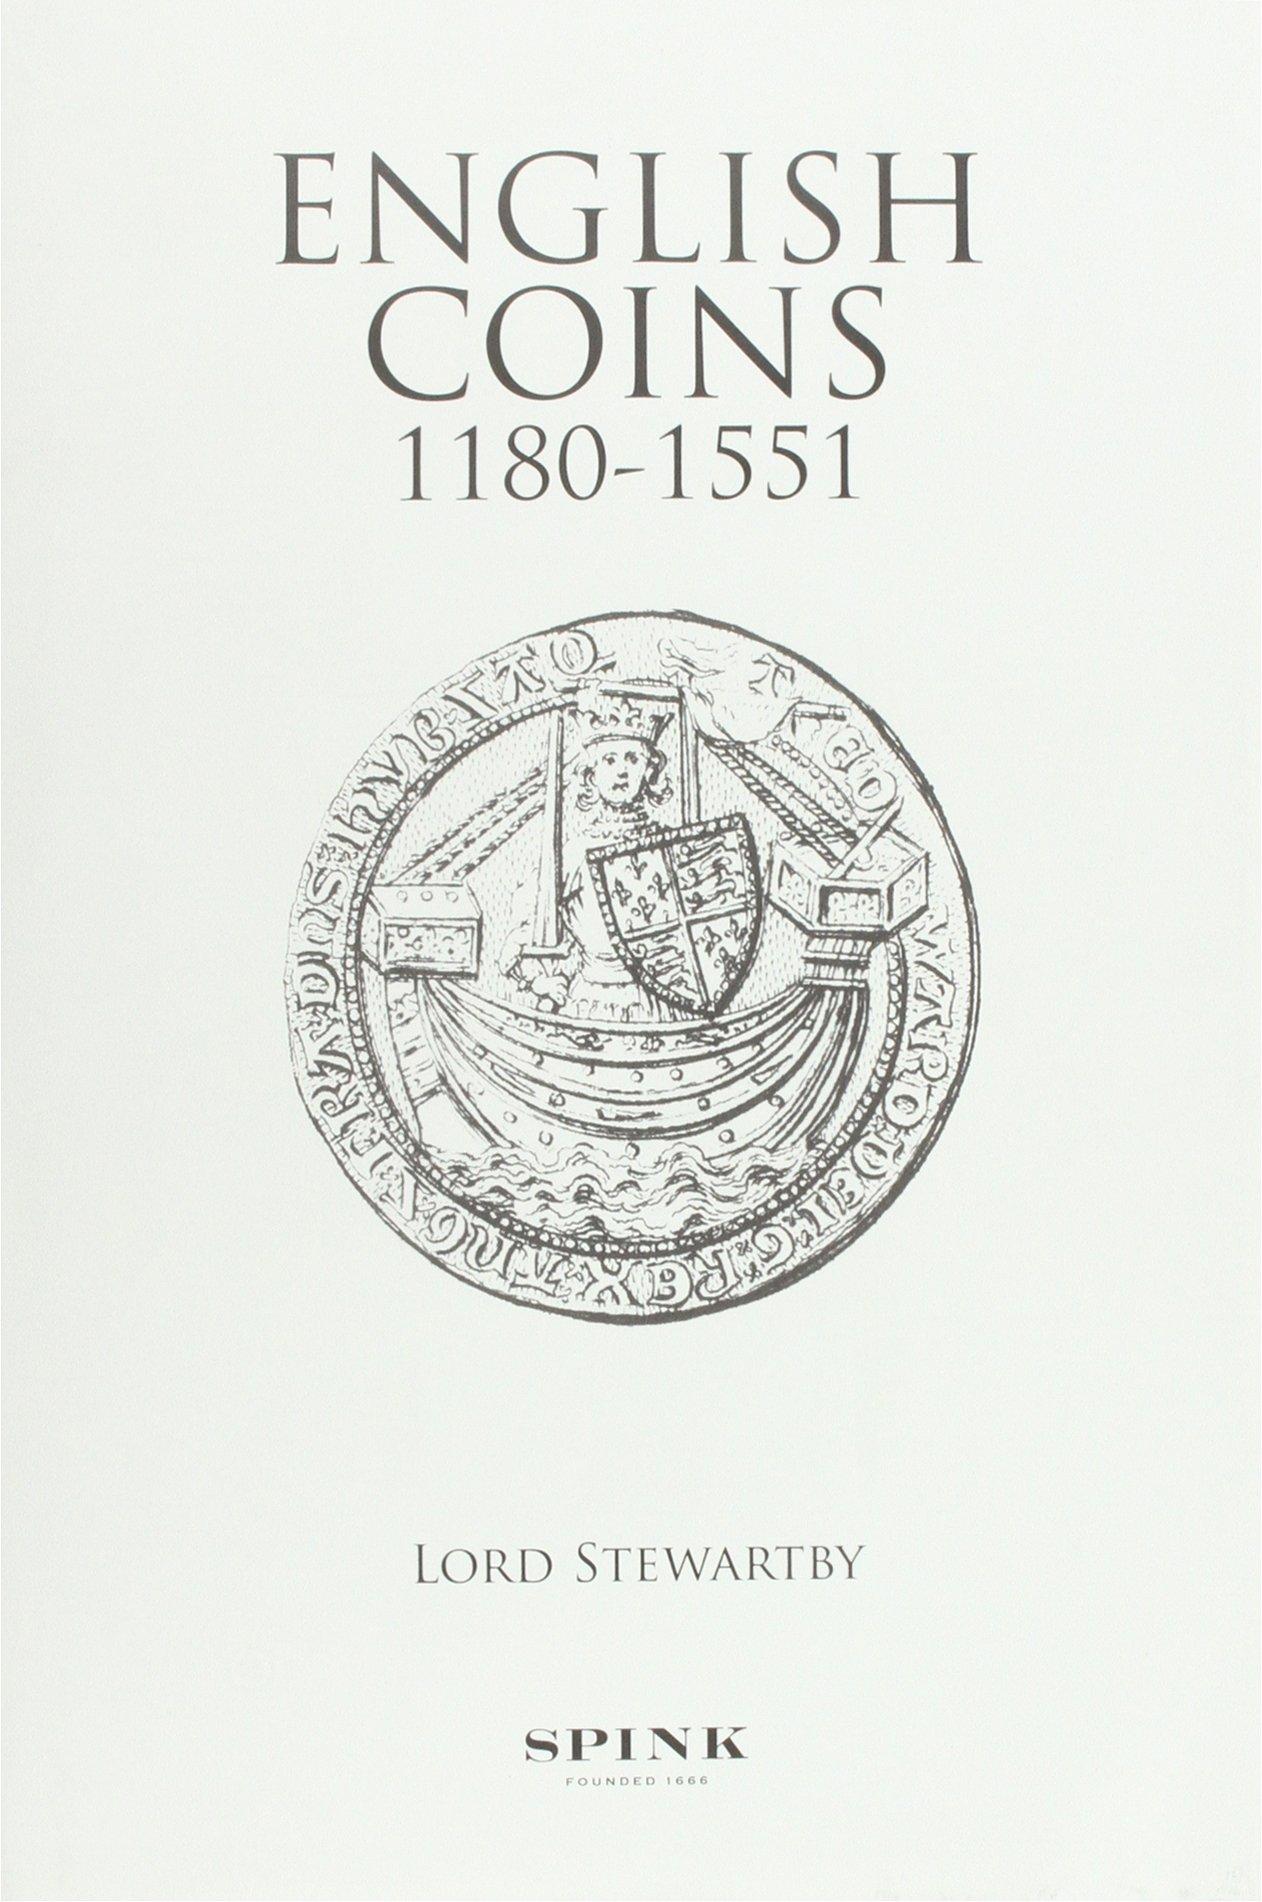 English Coins: 1180-1551